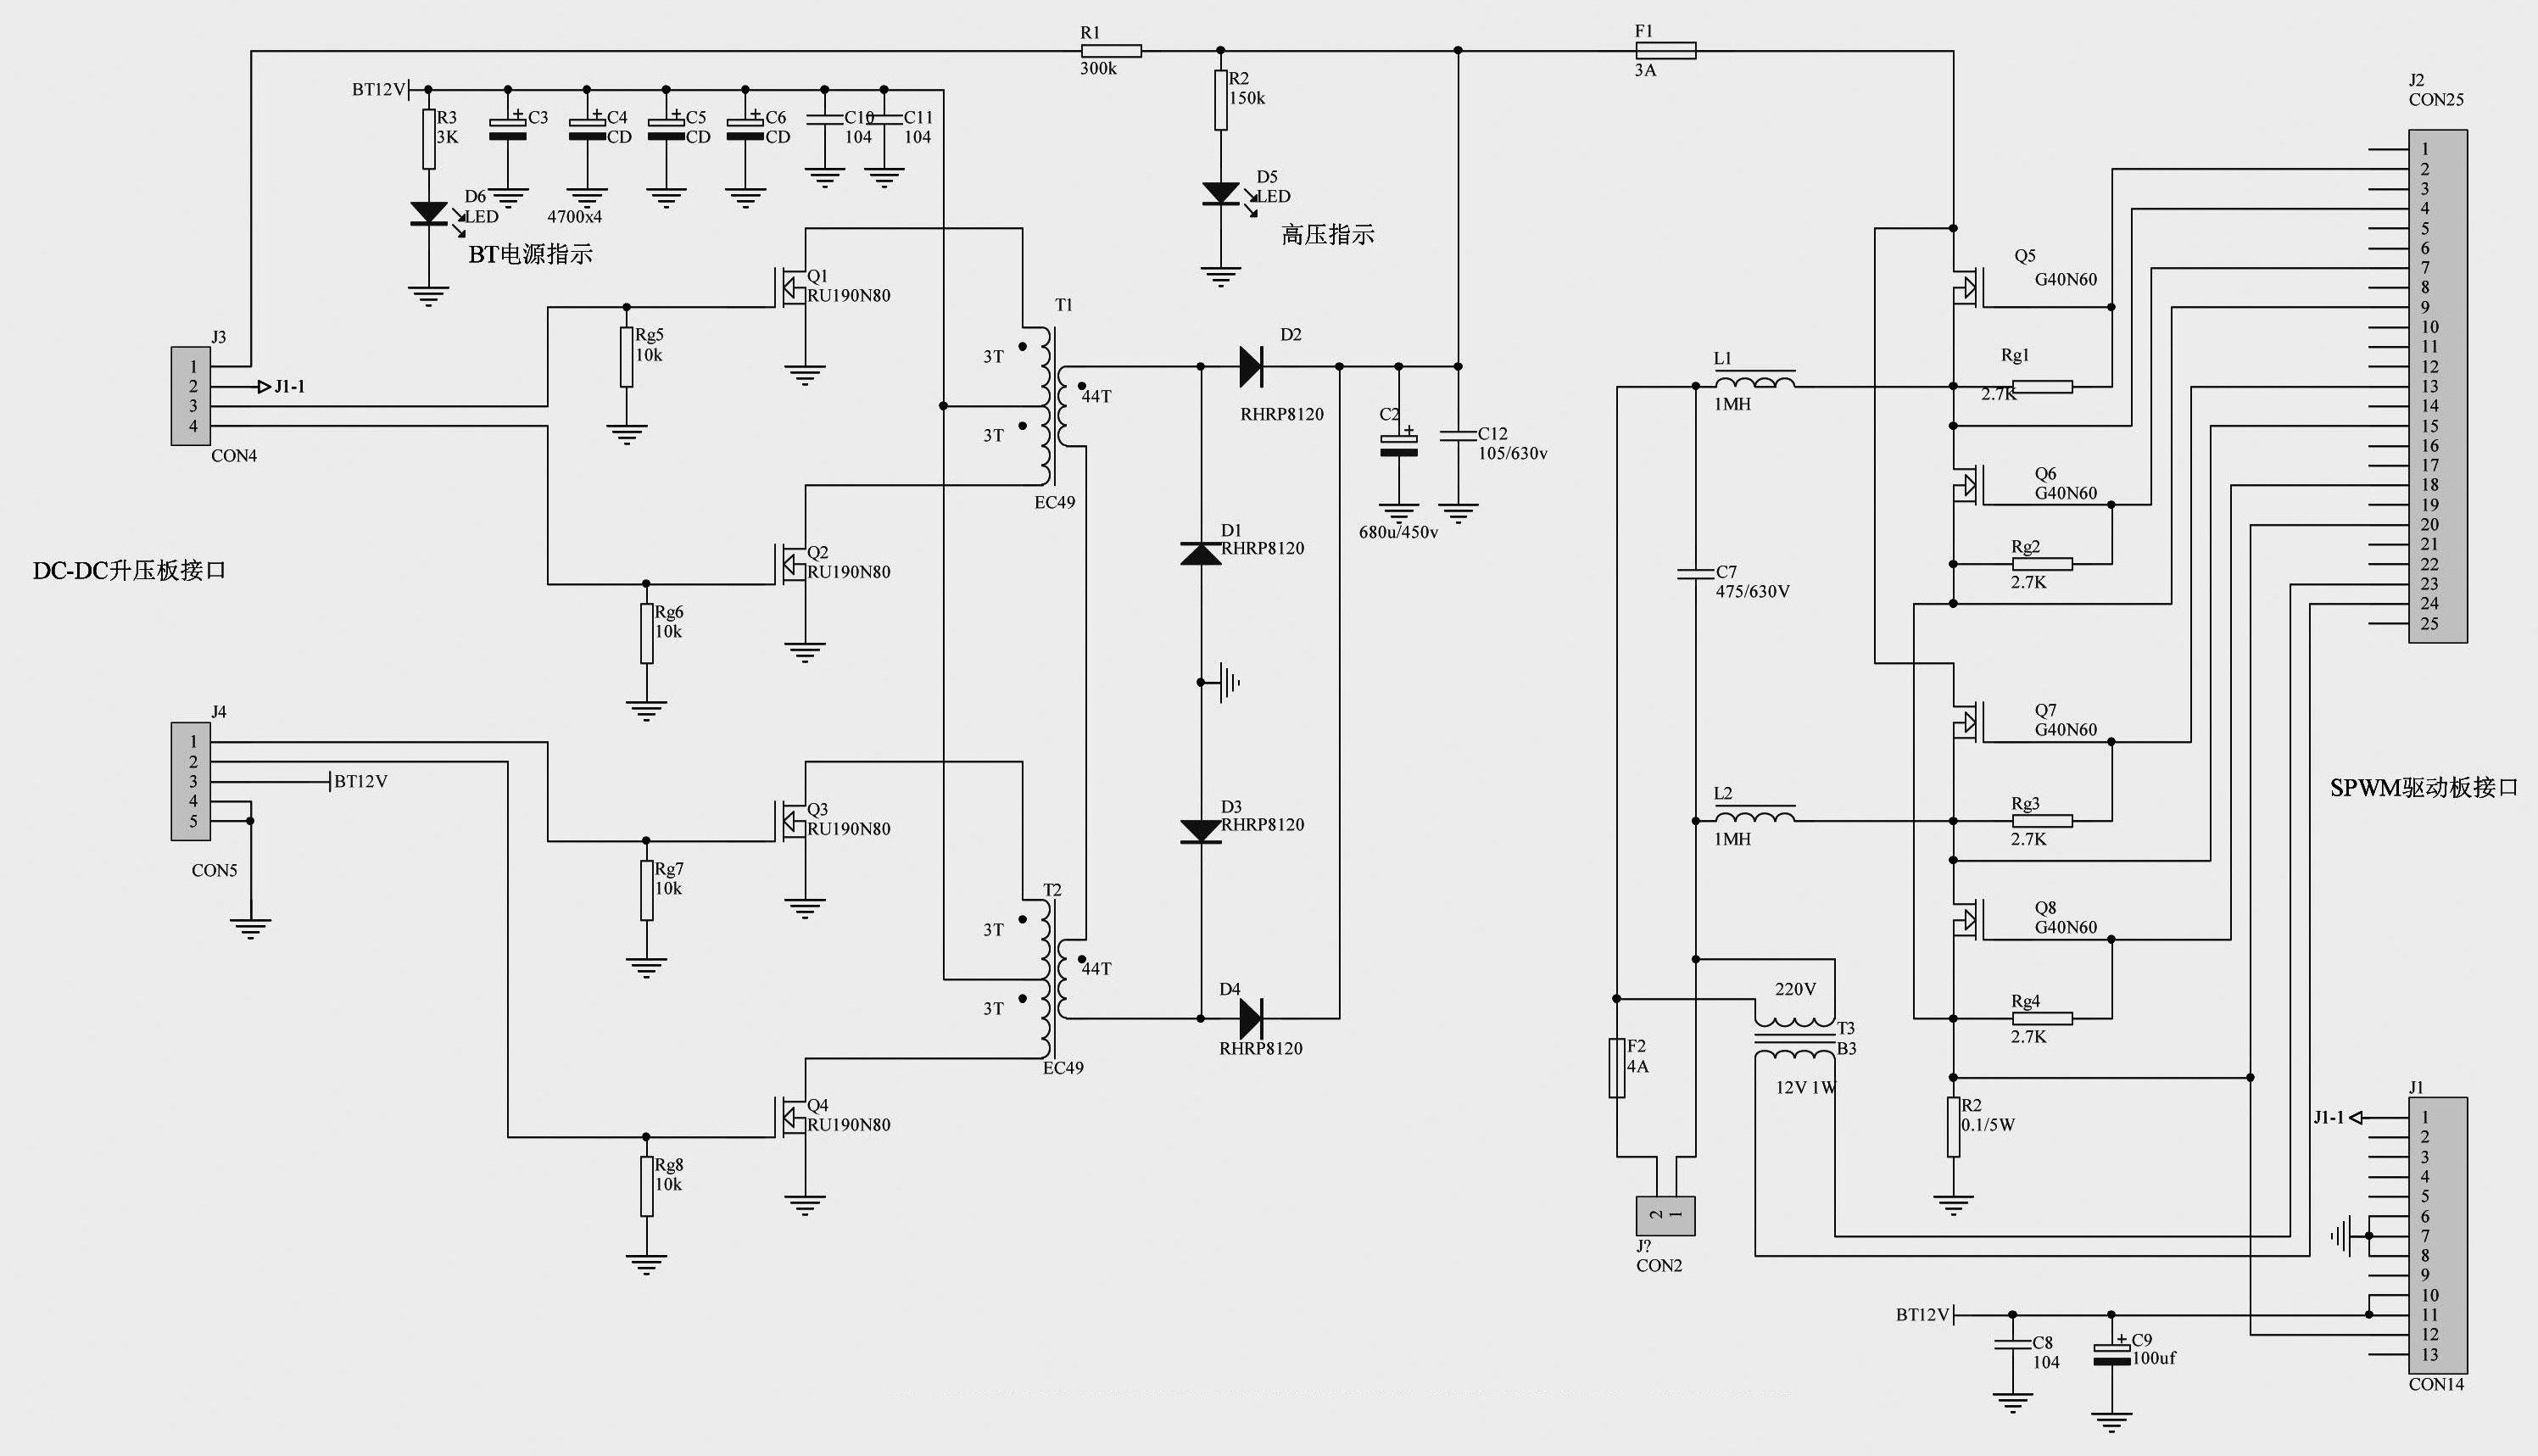 wiring diagram for inverter clipsal phone socket 12 volt 1000 watt power design process gohz